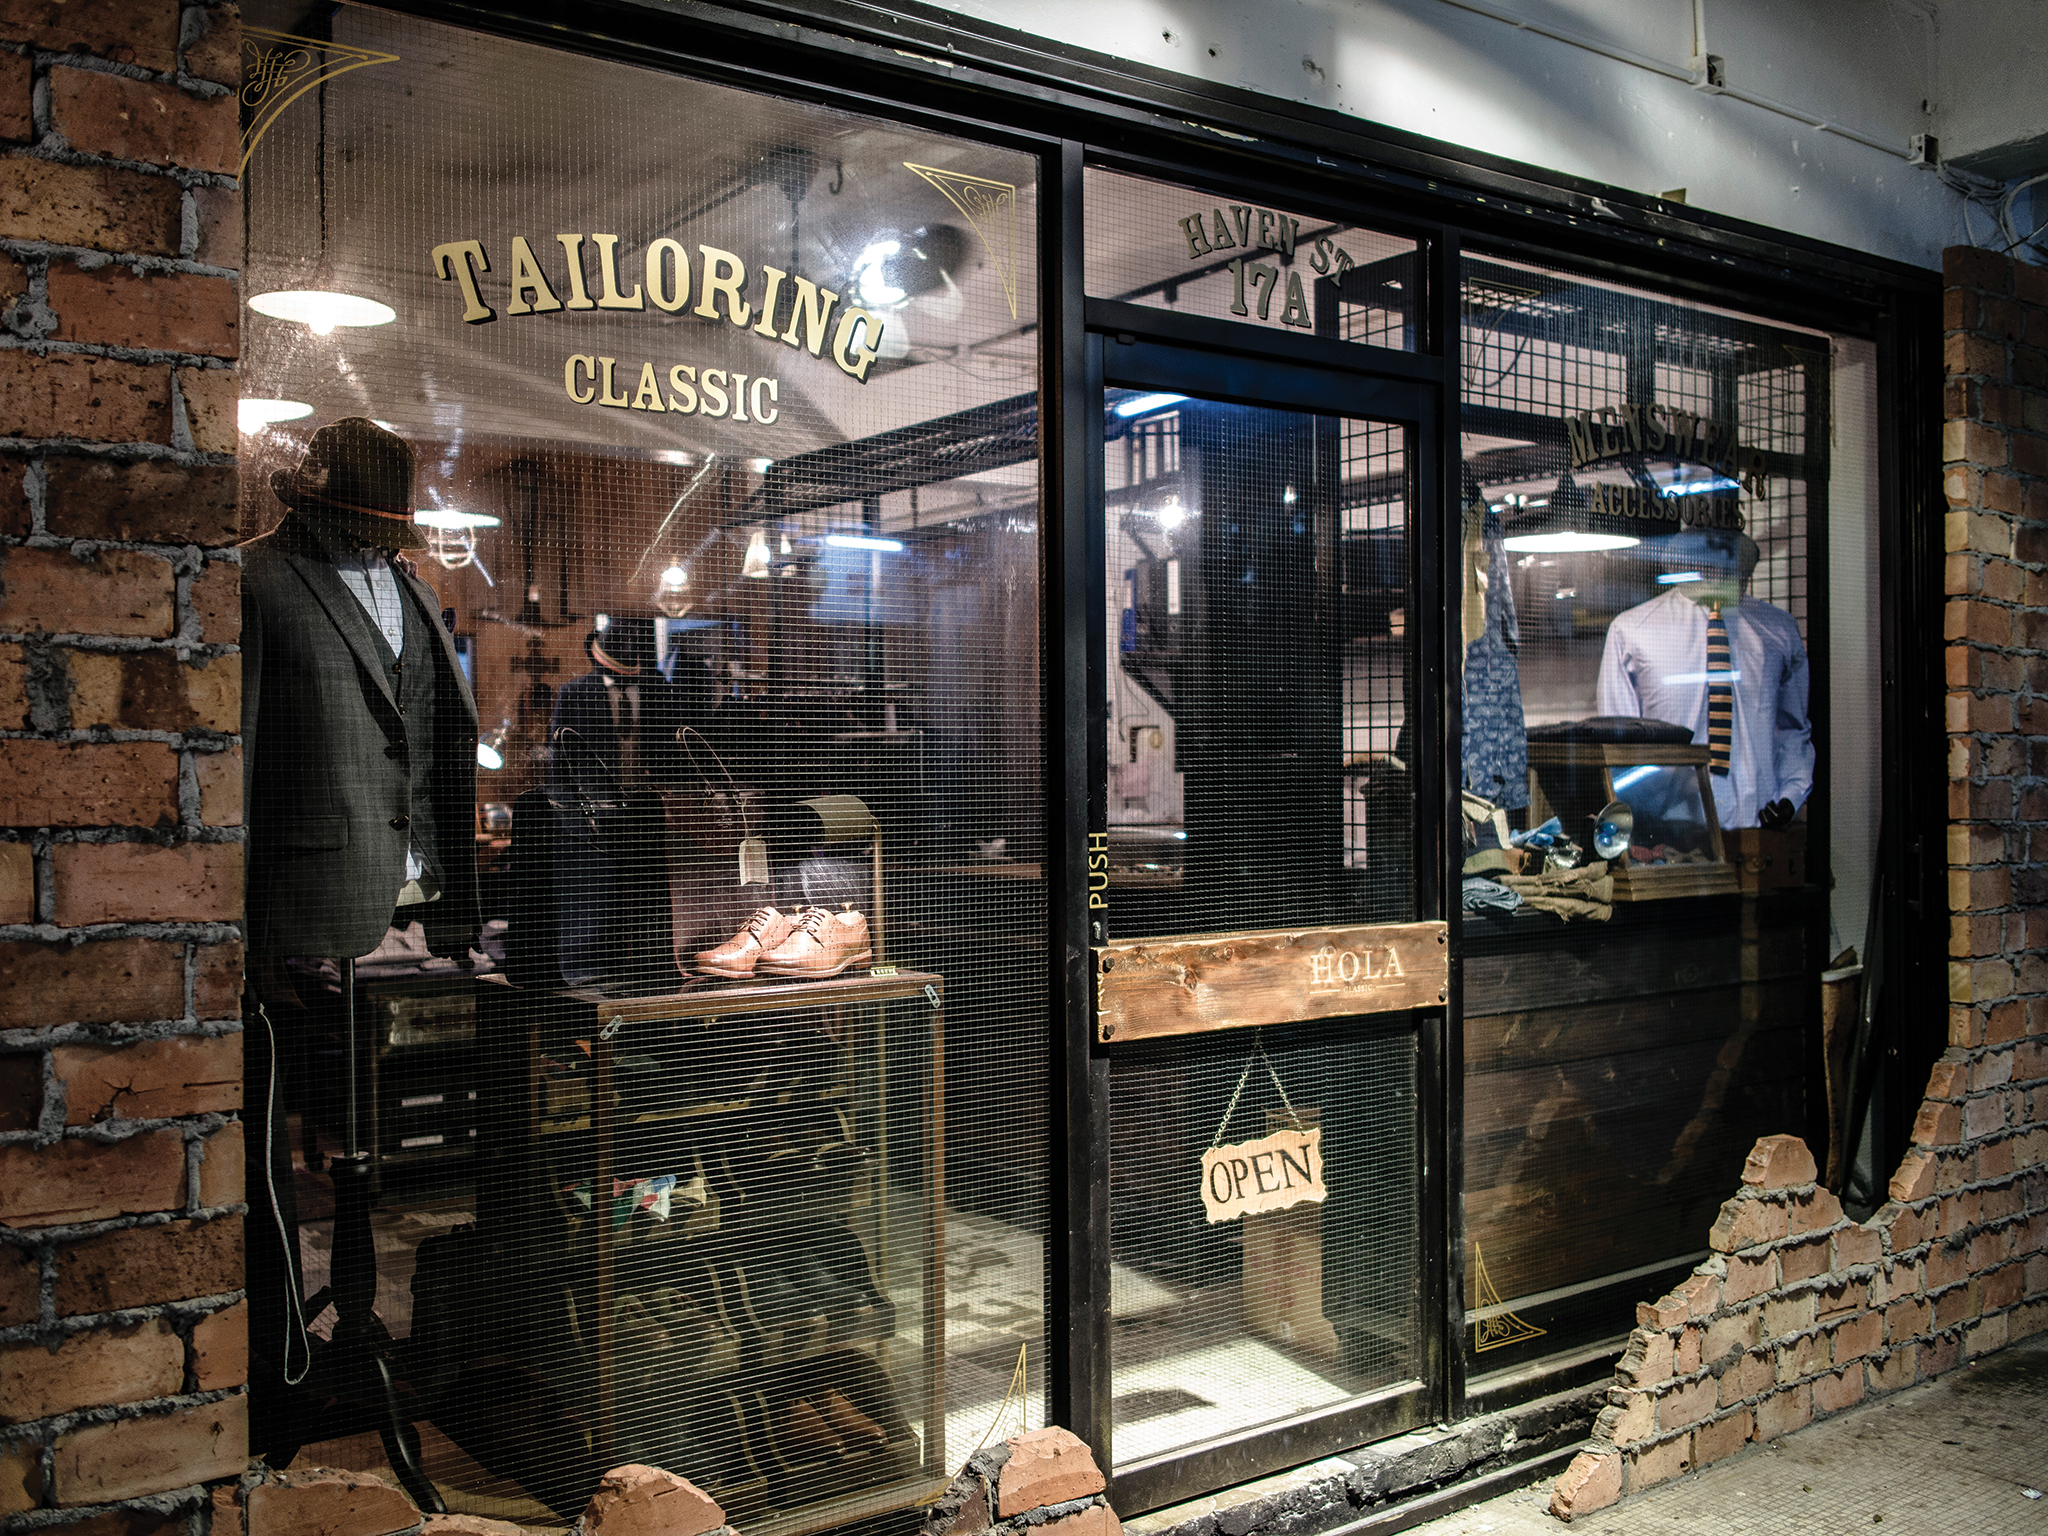 Hola Classic men's tailoring